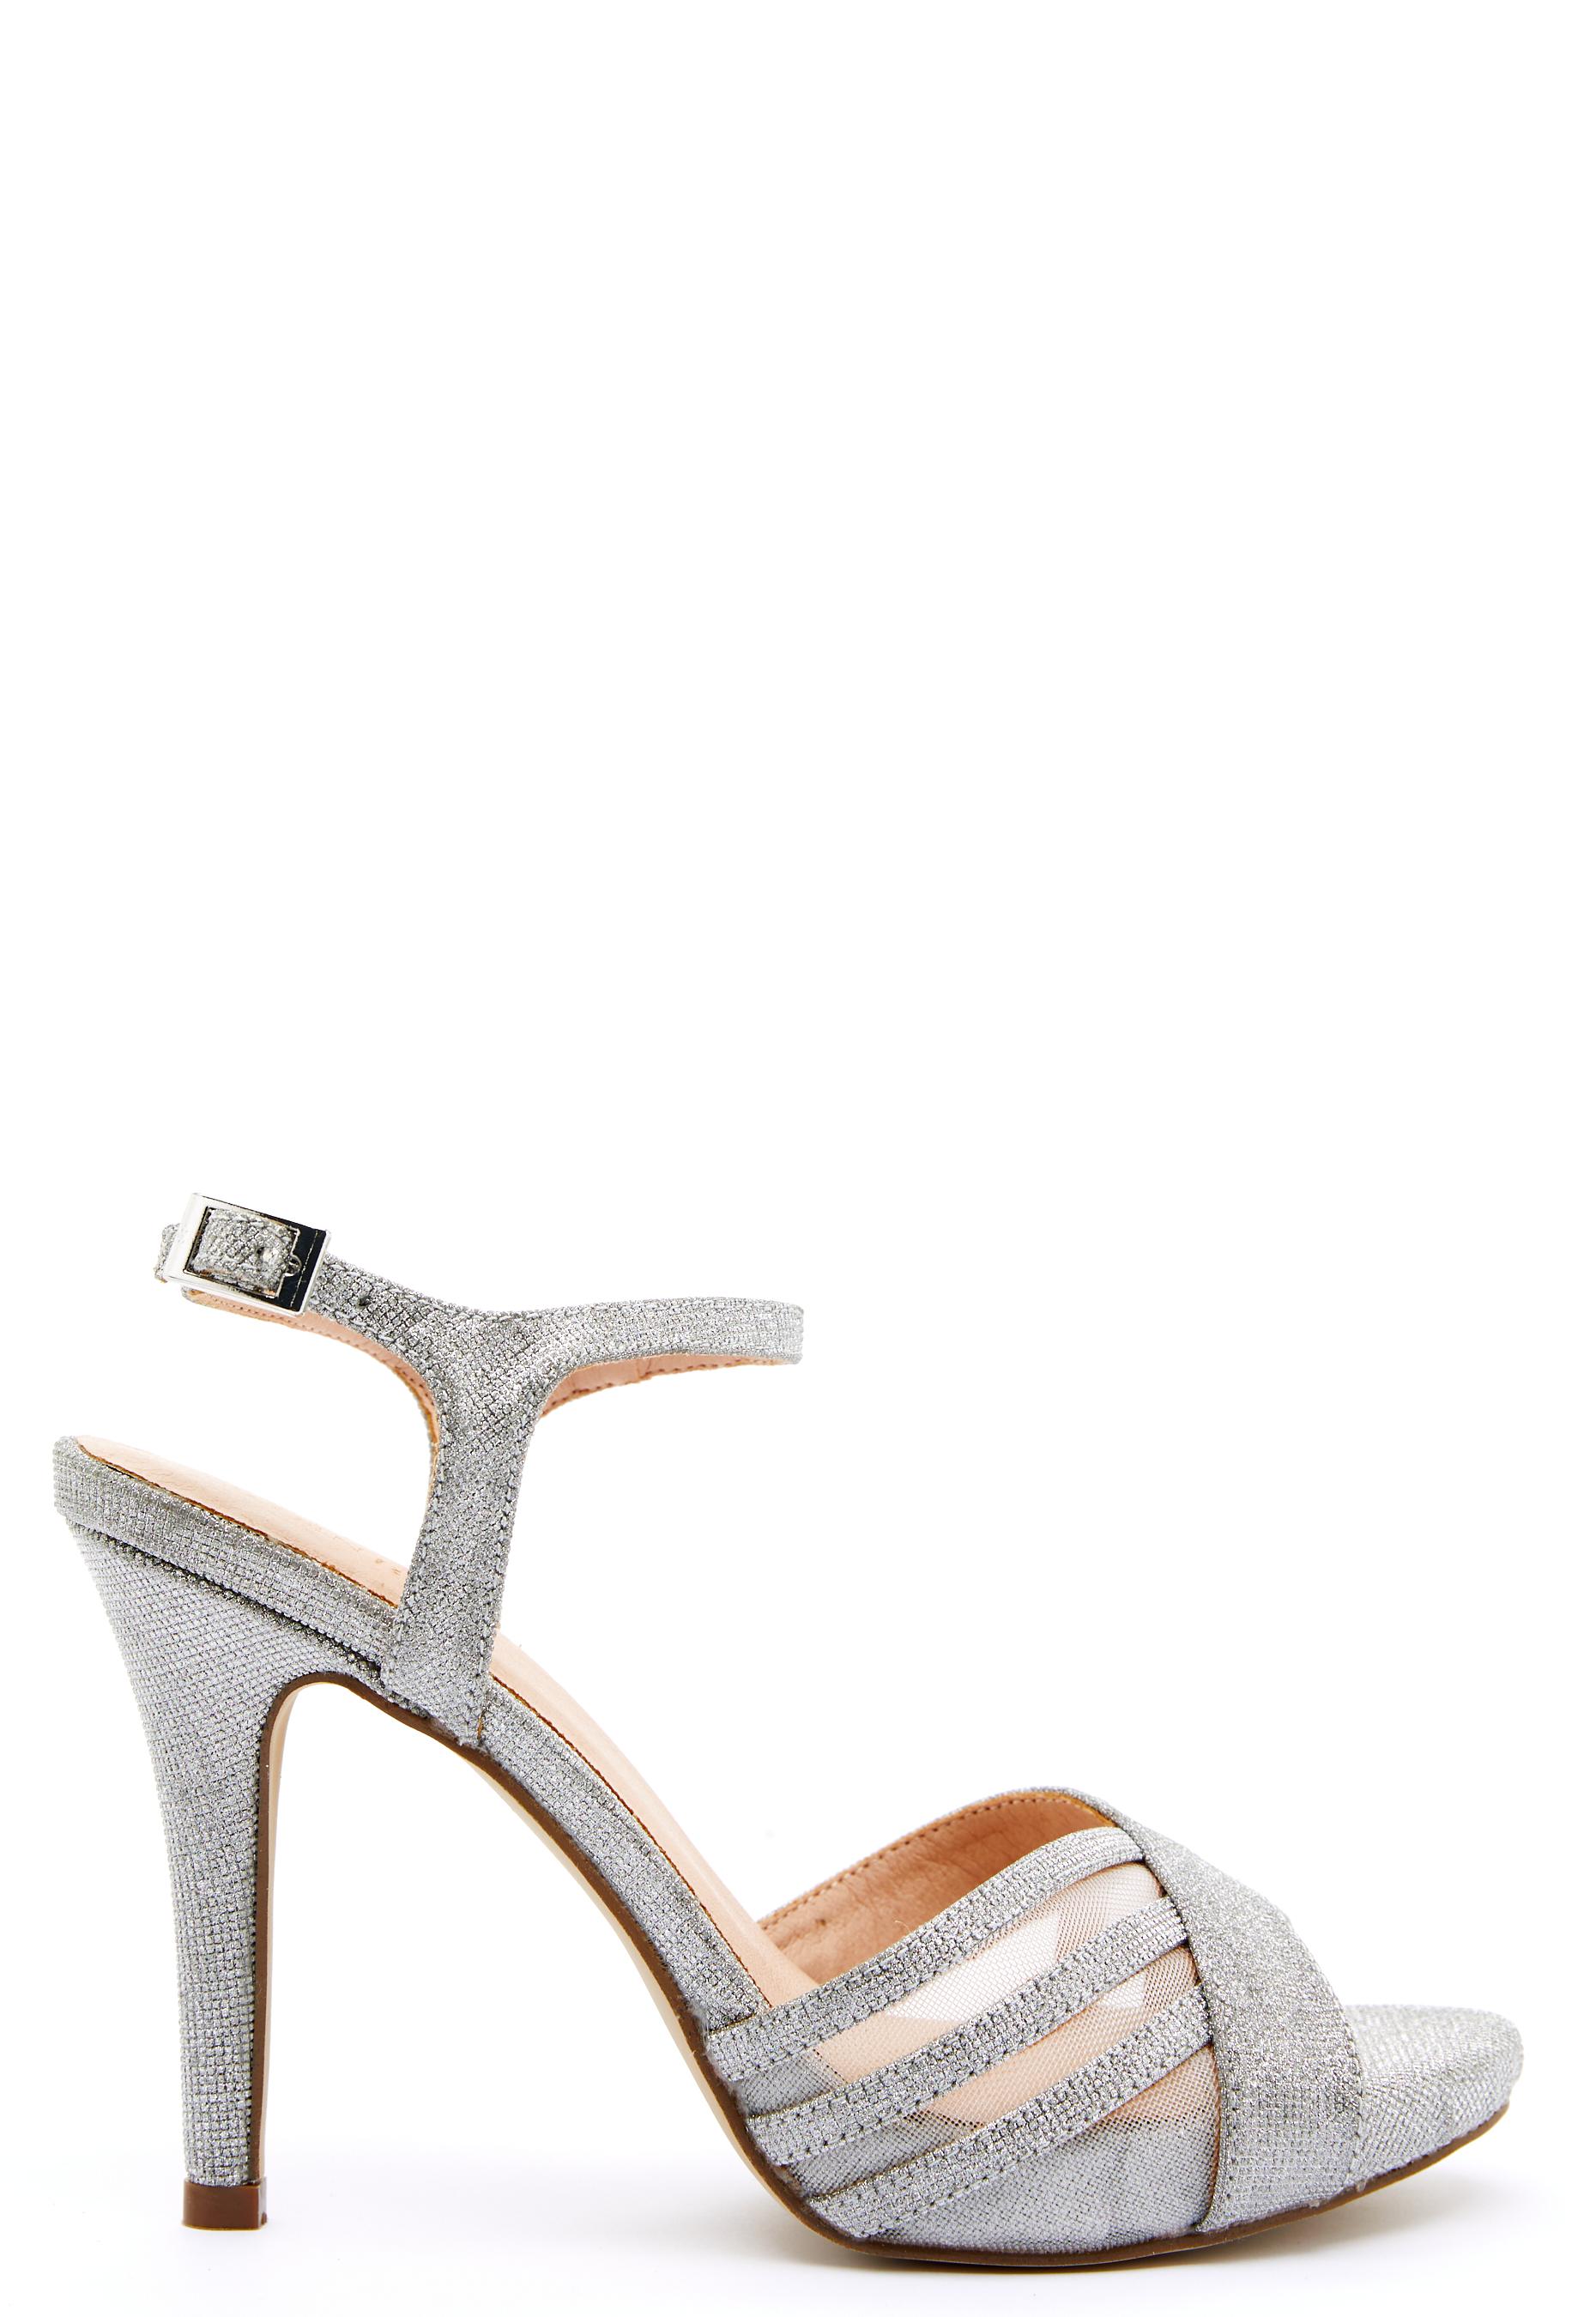 menbur glitter sandals silver 1